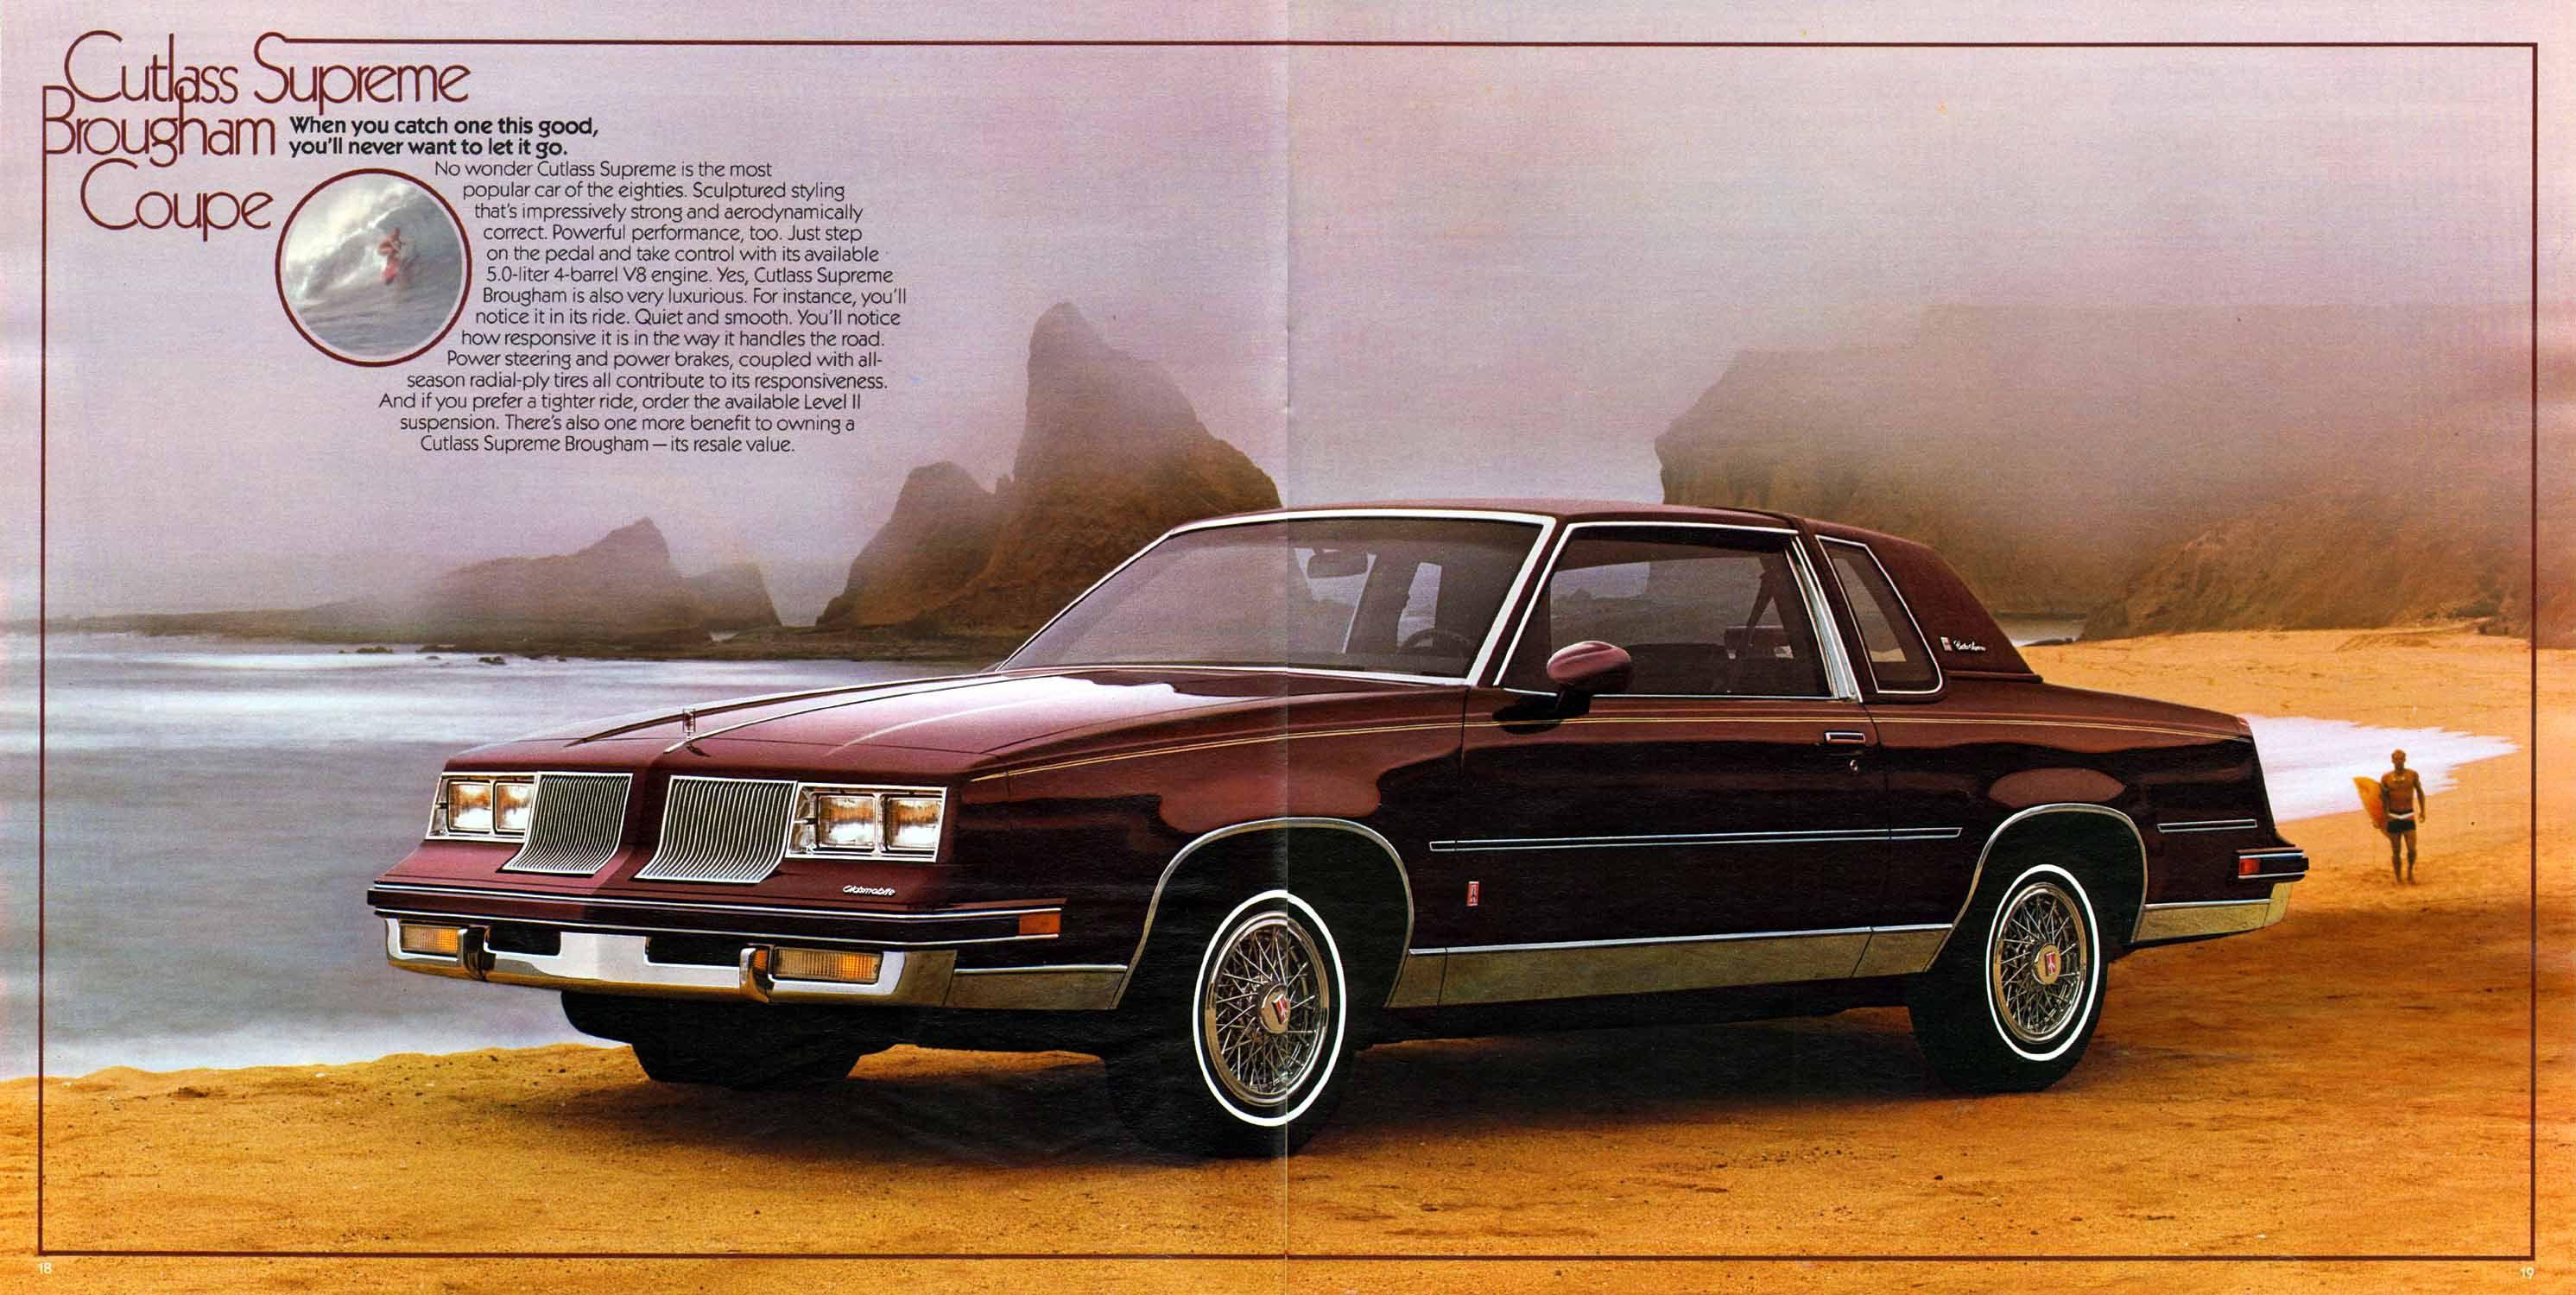 1986 Oldsmobile Cutlass Supreme Brougham Coupe Oldsmobile Cutlass Oldsmobile Cutlass Supreme Oldsmobile